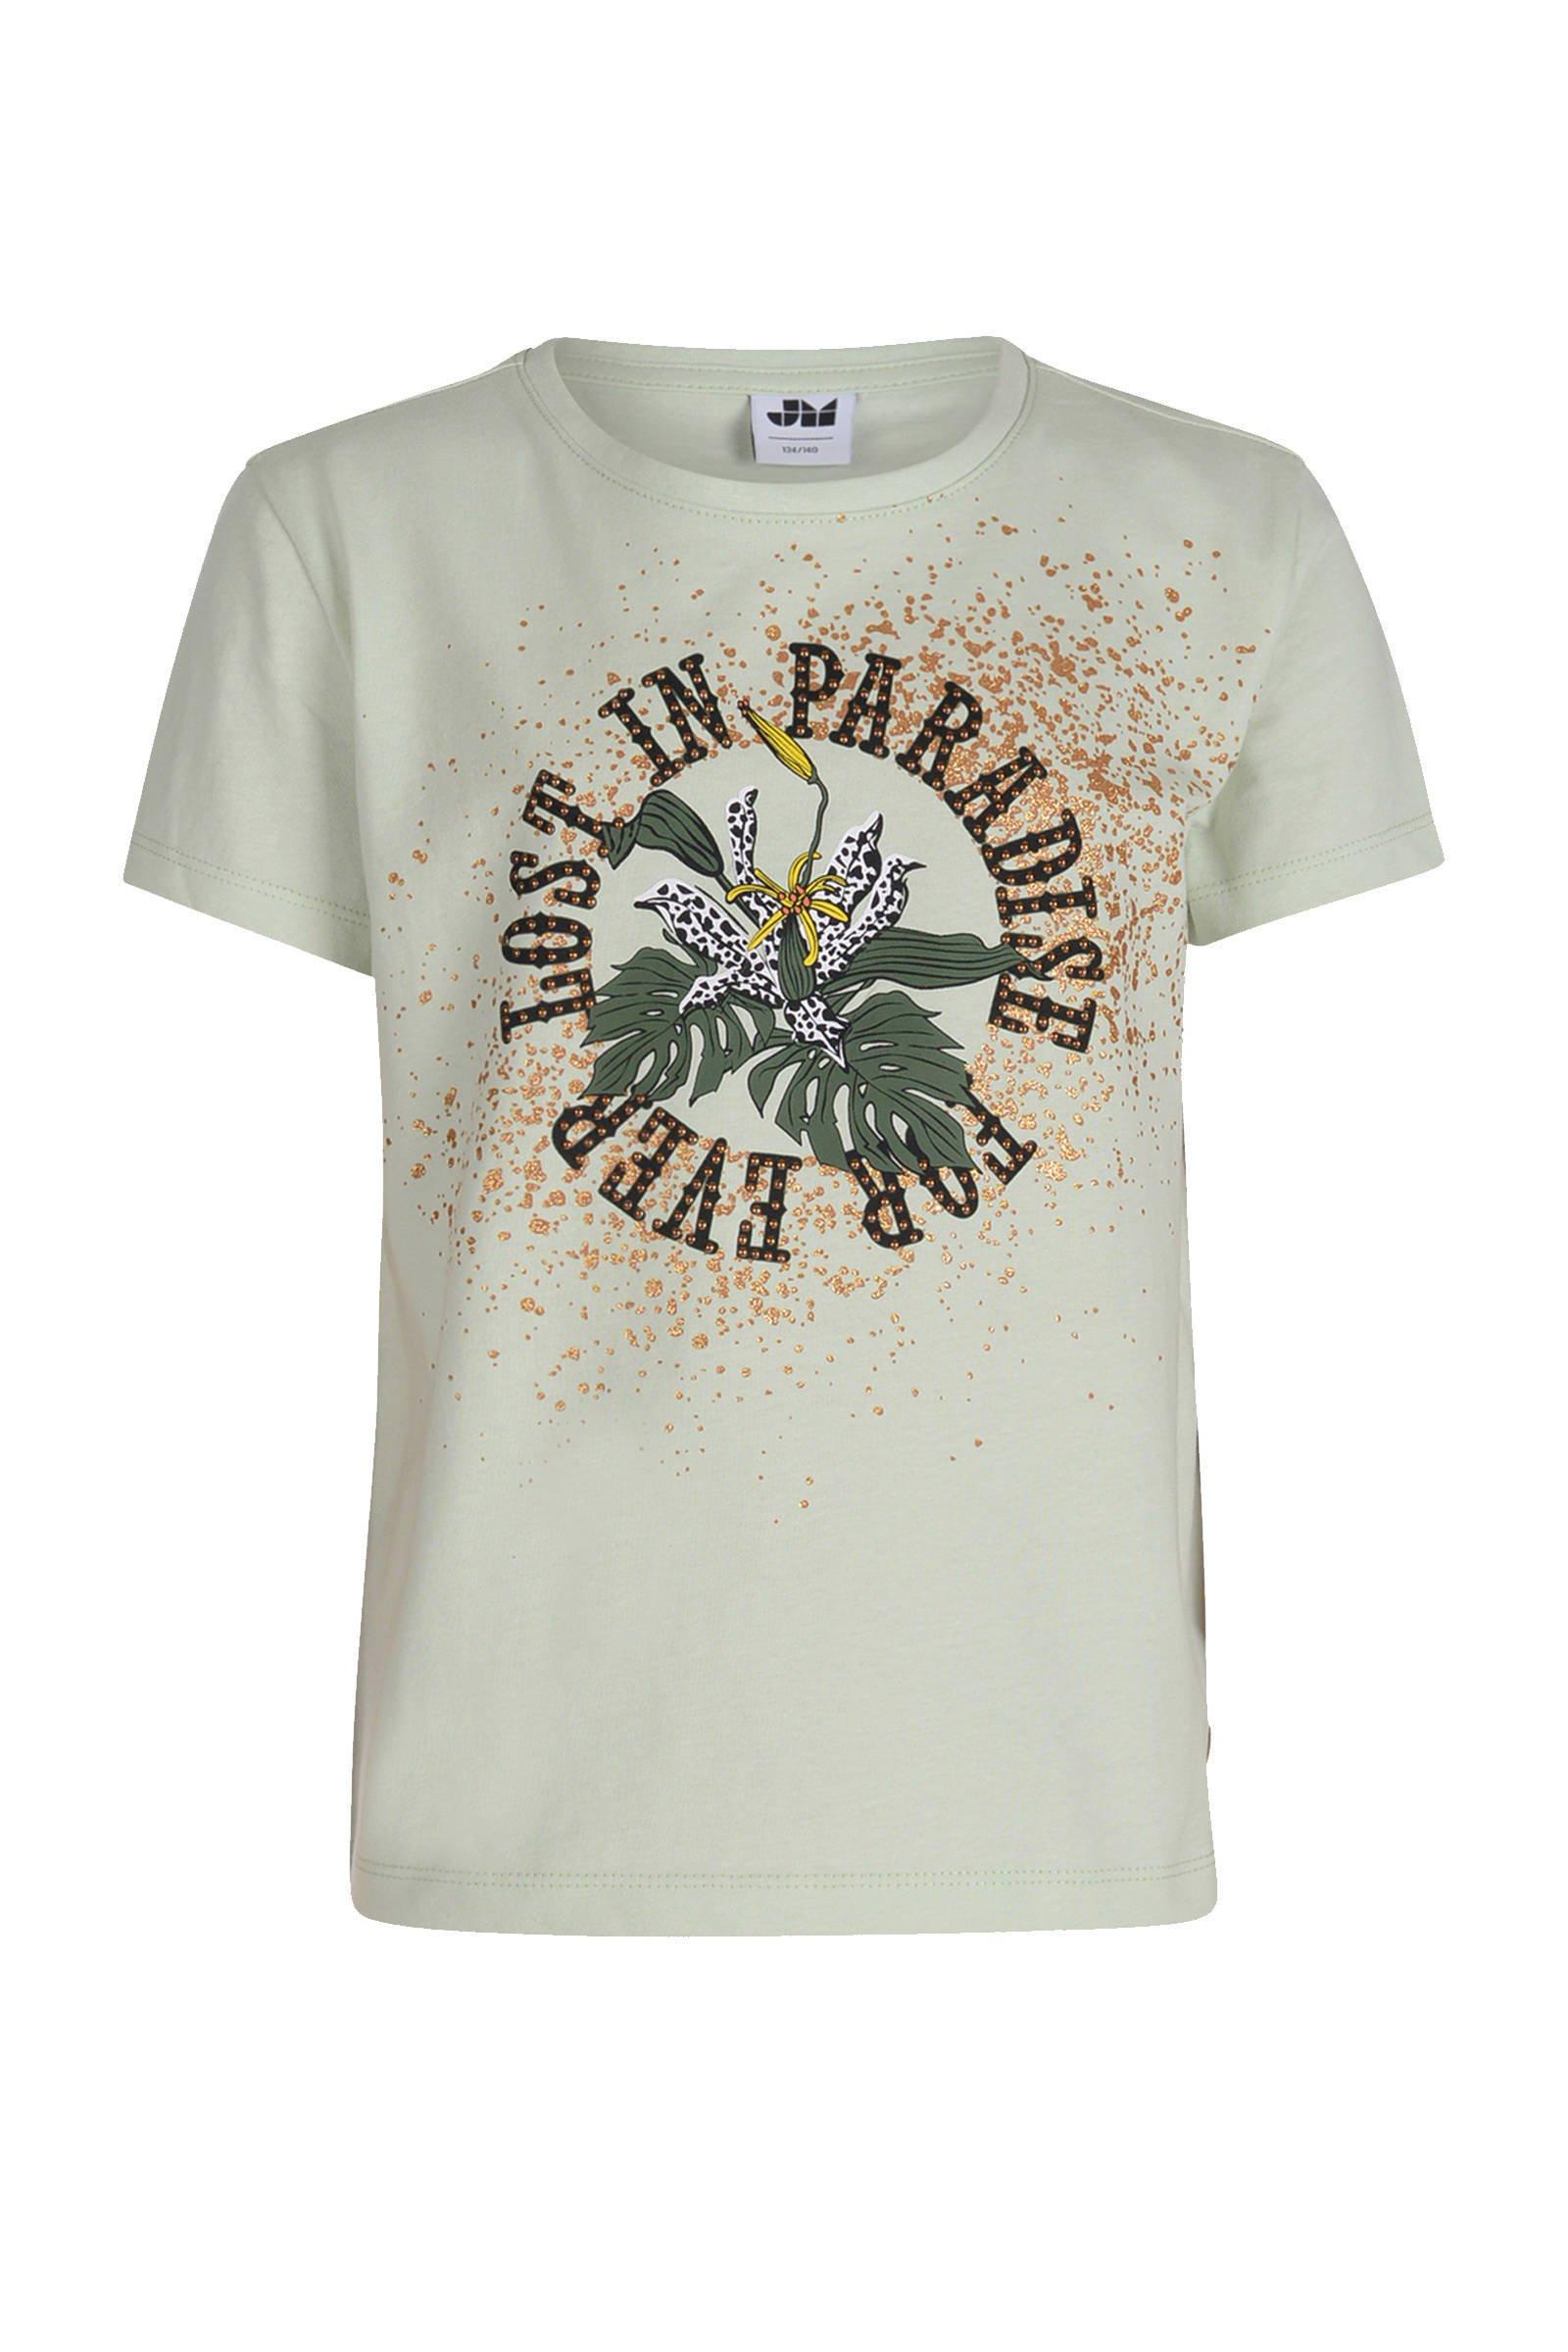 Jill & Mitch by Shoeby T-shirt Harmony met printopdruk lichtgroen/oranje - maat 134/140